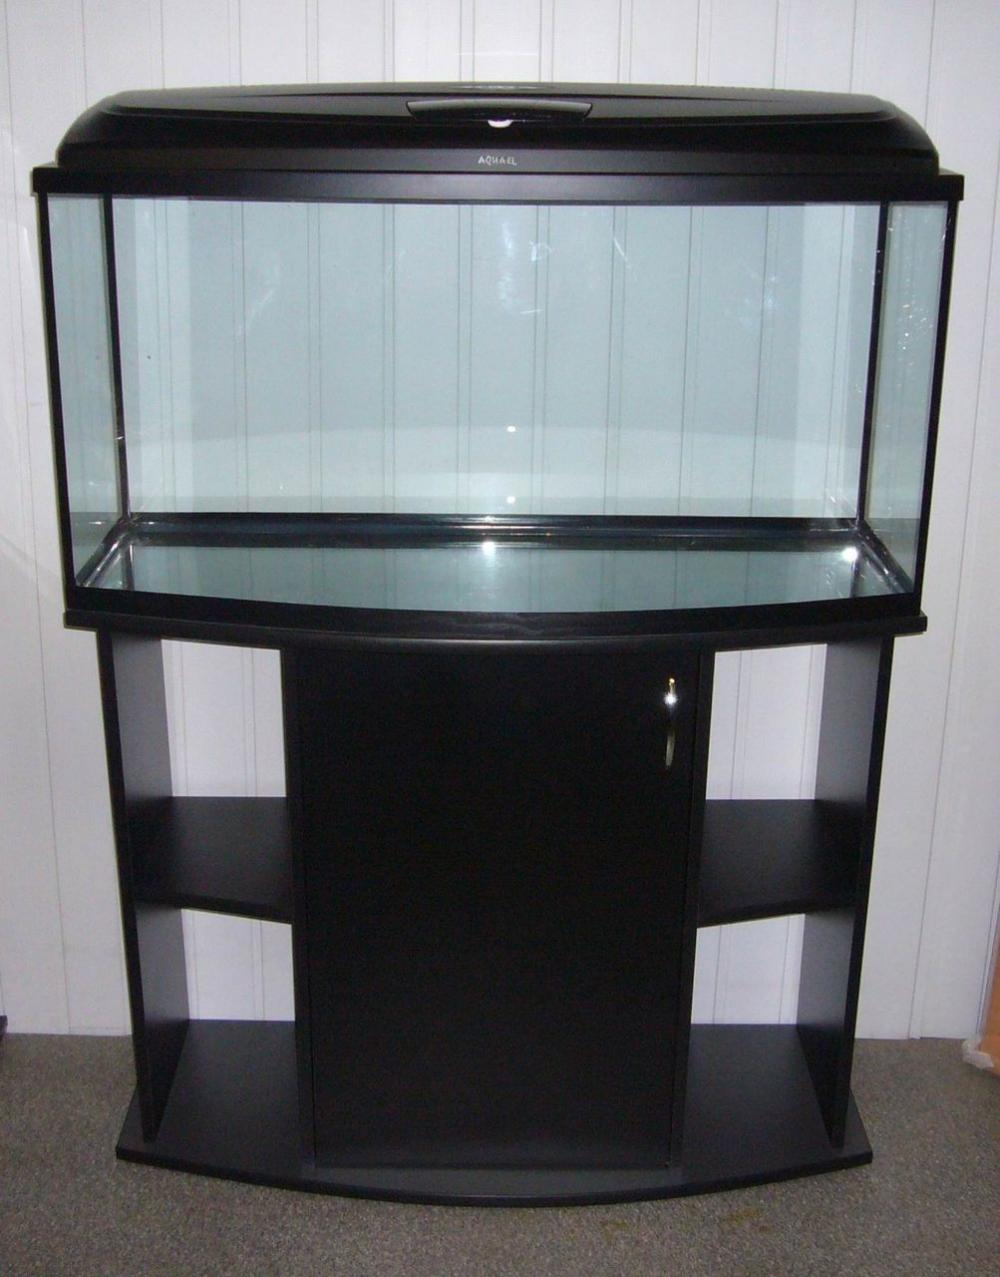 Купить аквариум 115 л. Aква Плюс с крышкой Aquael Аквариумы АКВАПЛЮС ...